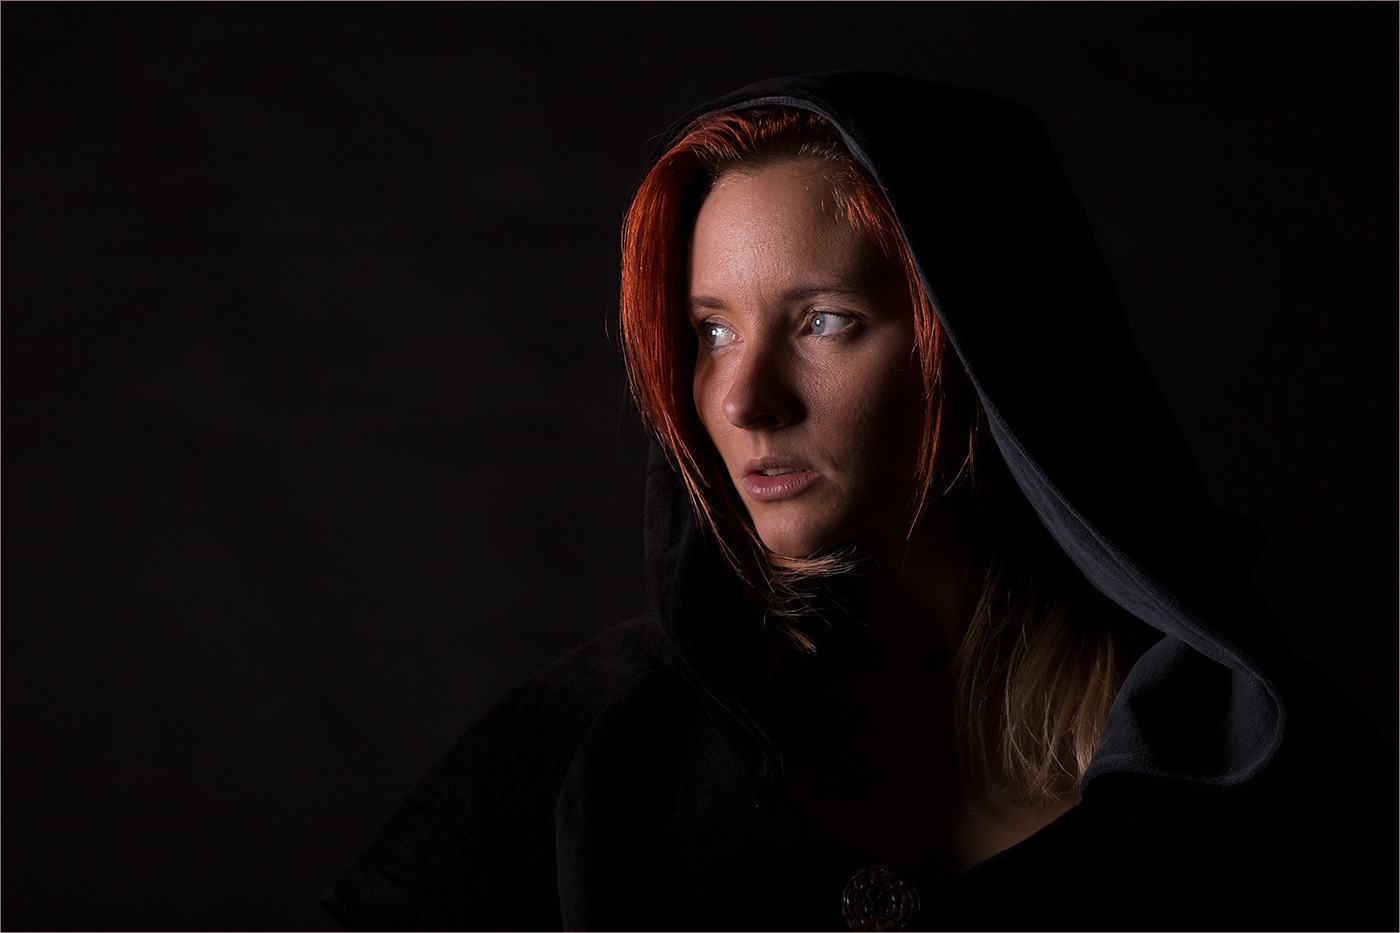 In The Dark by Richard Harding